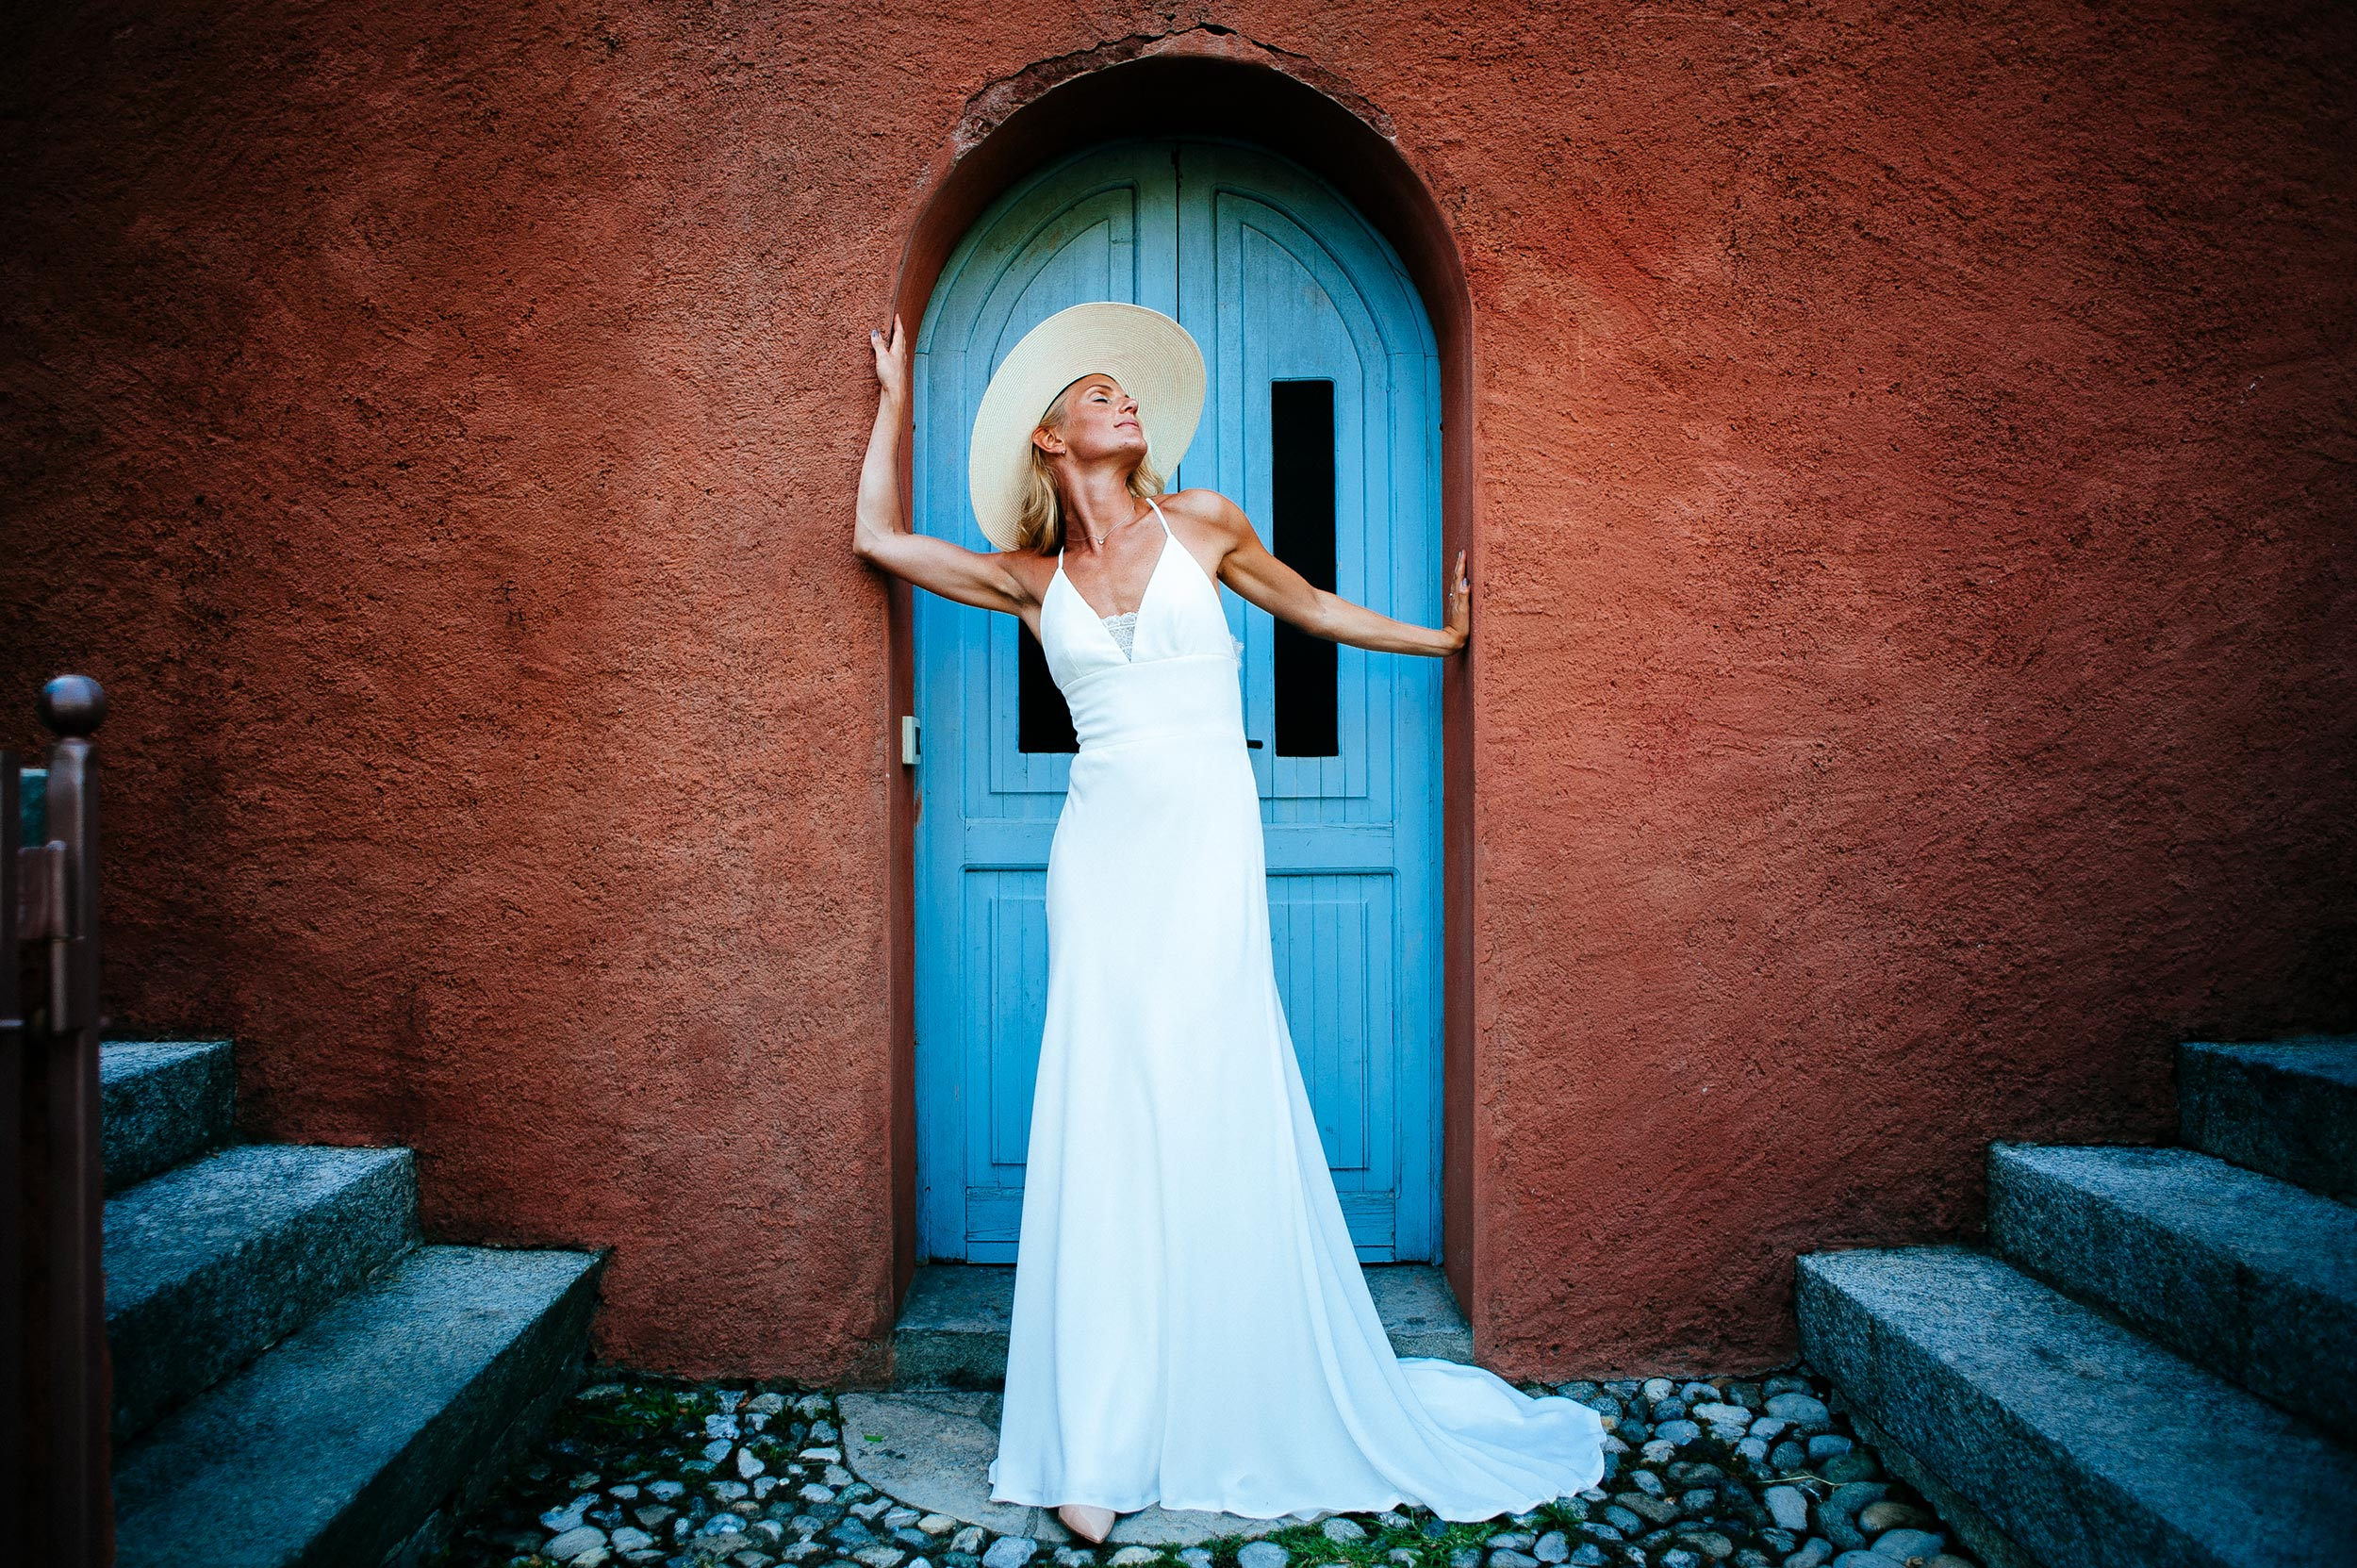 2018-Villa-Regina-Teodolinda-Lake-Como-Wedding-Photographer-Italy-Alessandro-Avenali-238.jpg